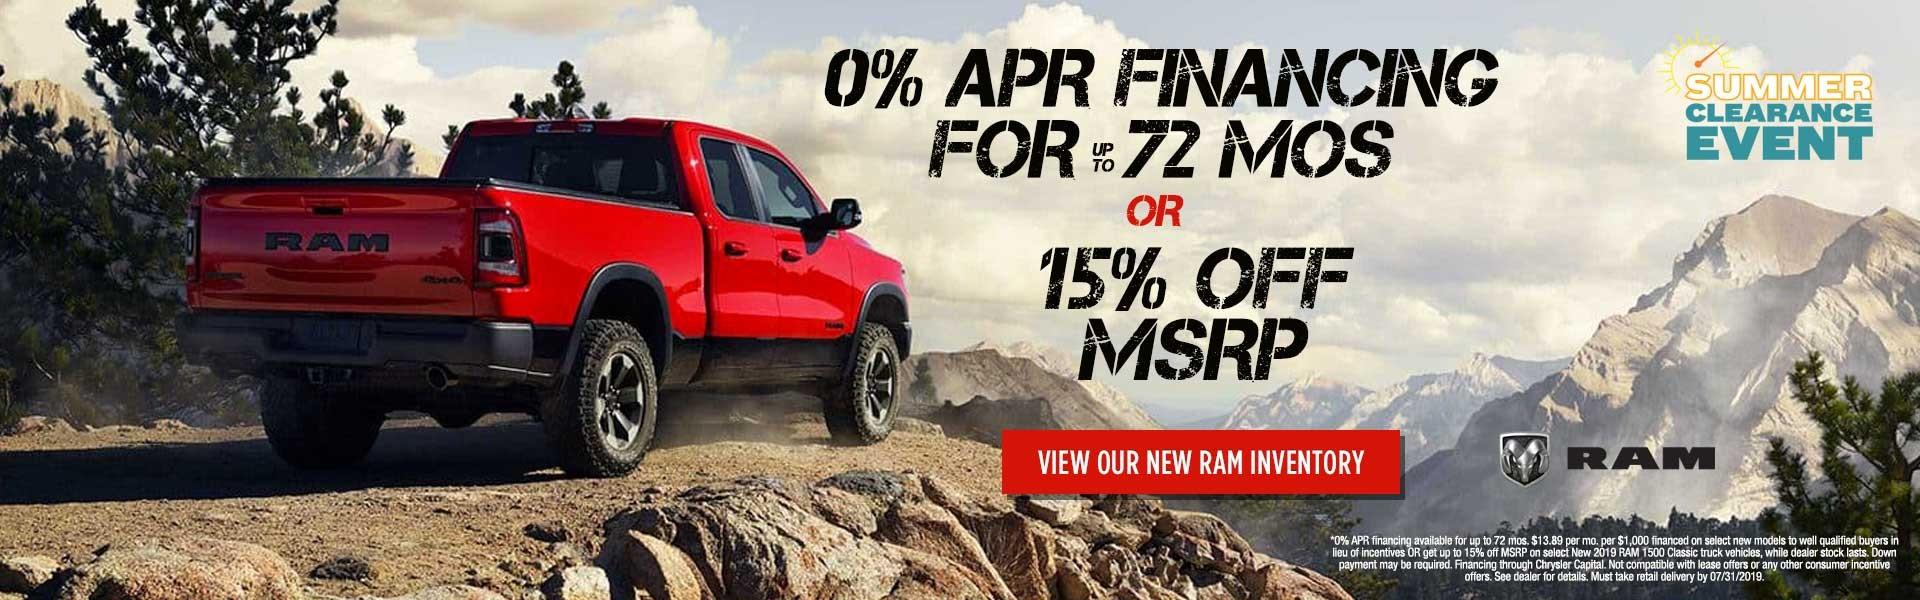 Dual Ram July Offer